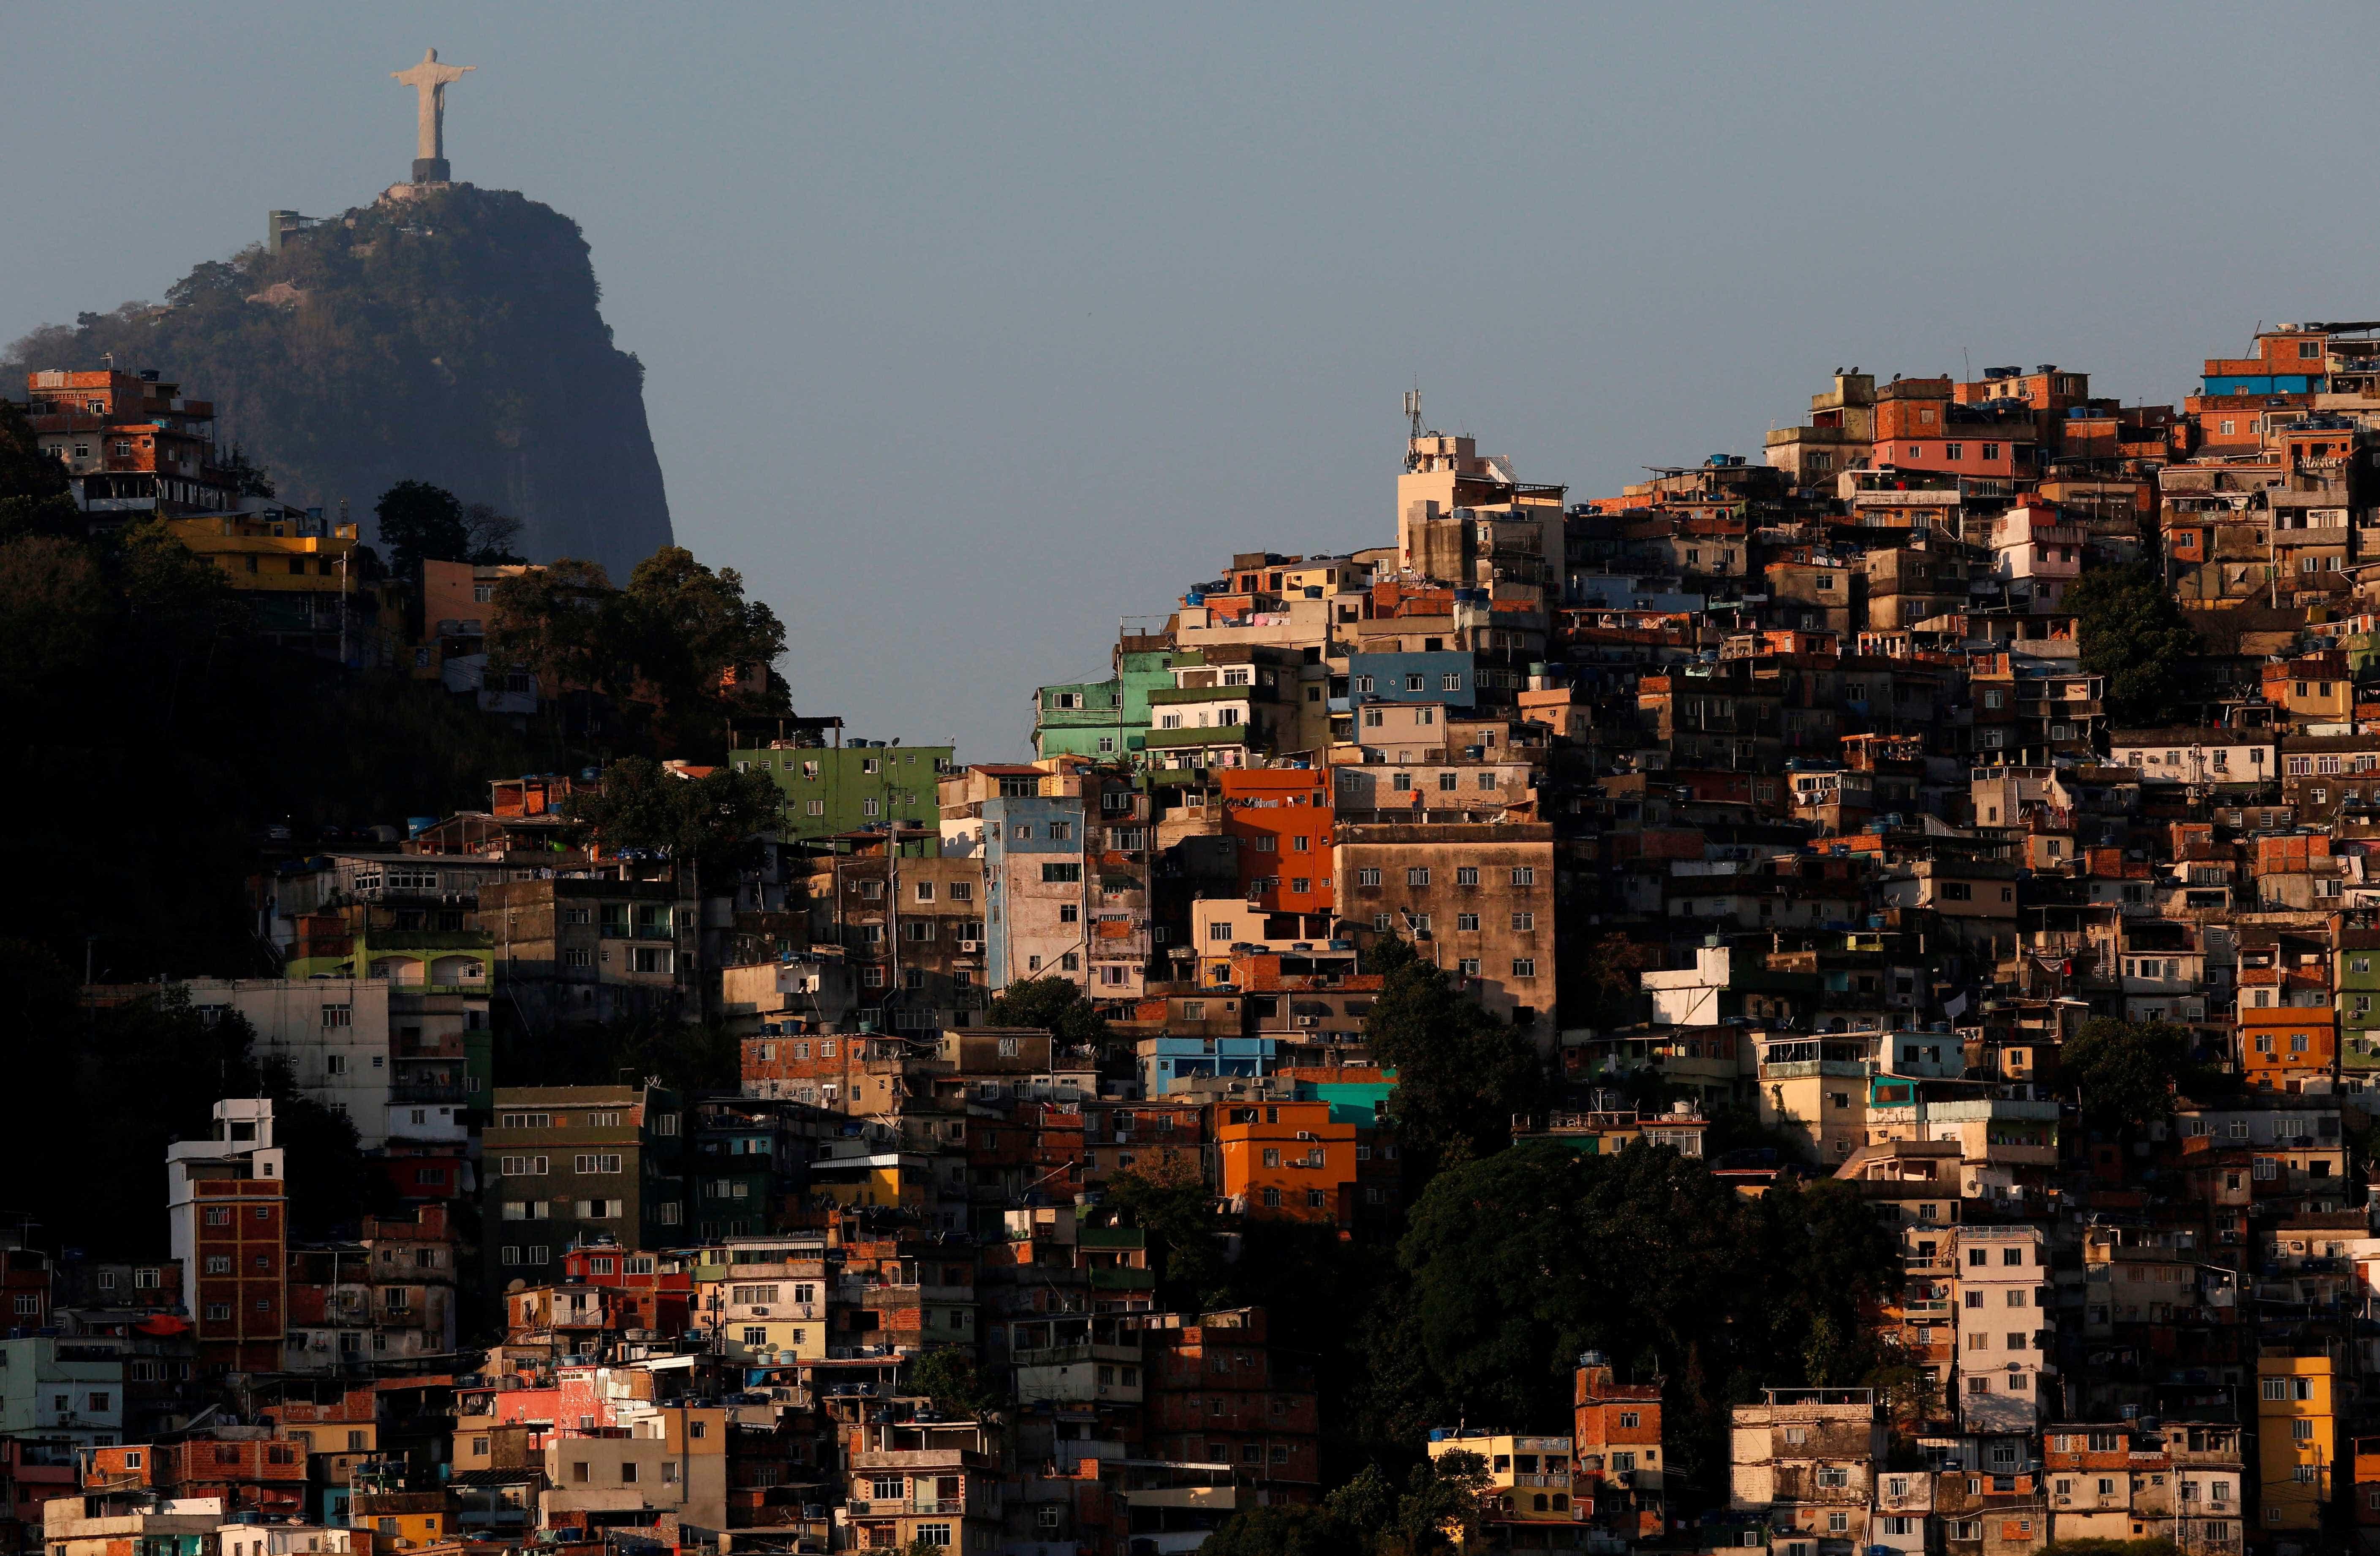 Brasil estaciona no 79º lugar no ranking do IDH; Noruega lidera